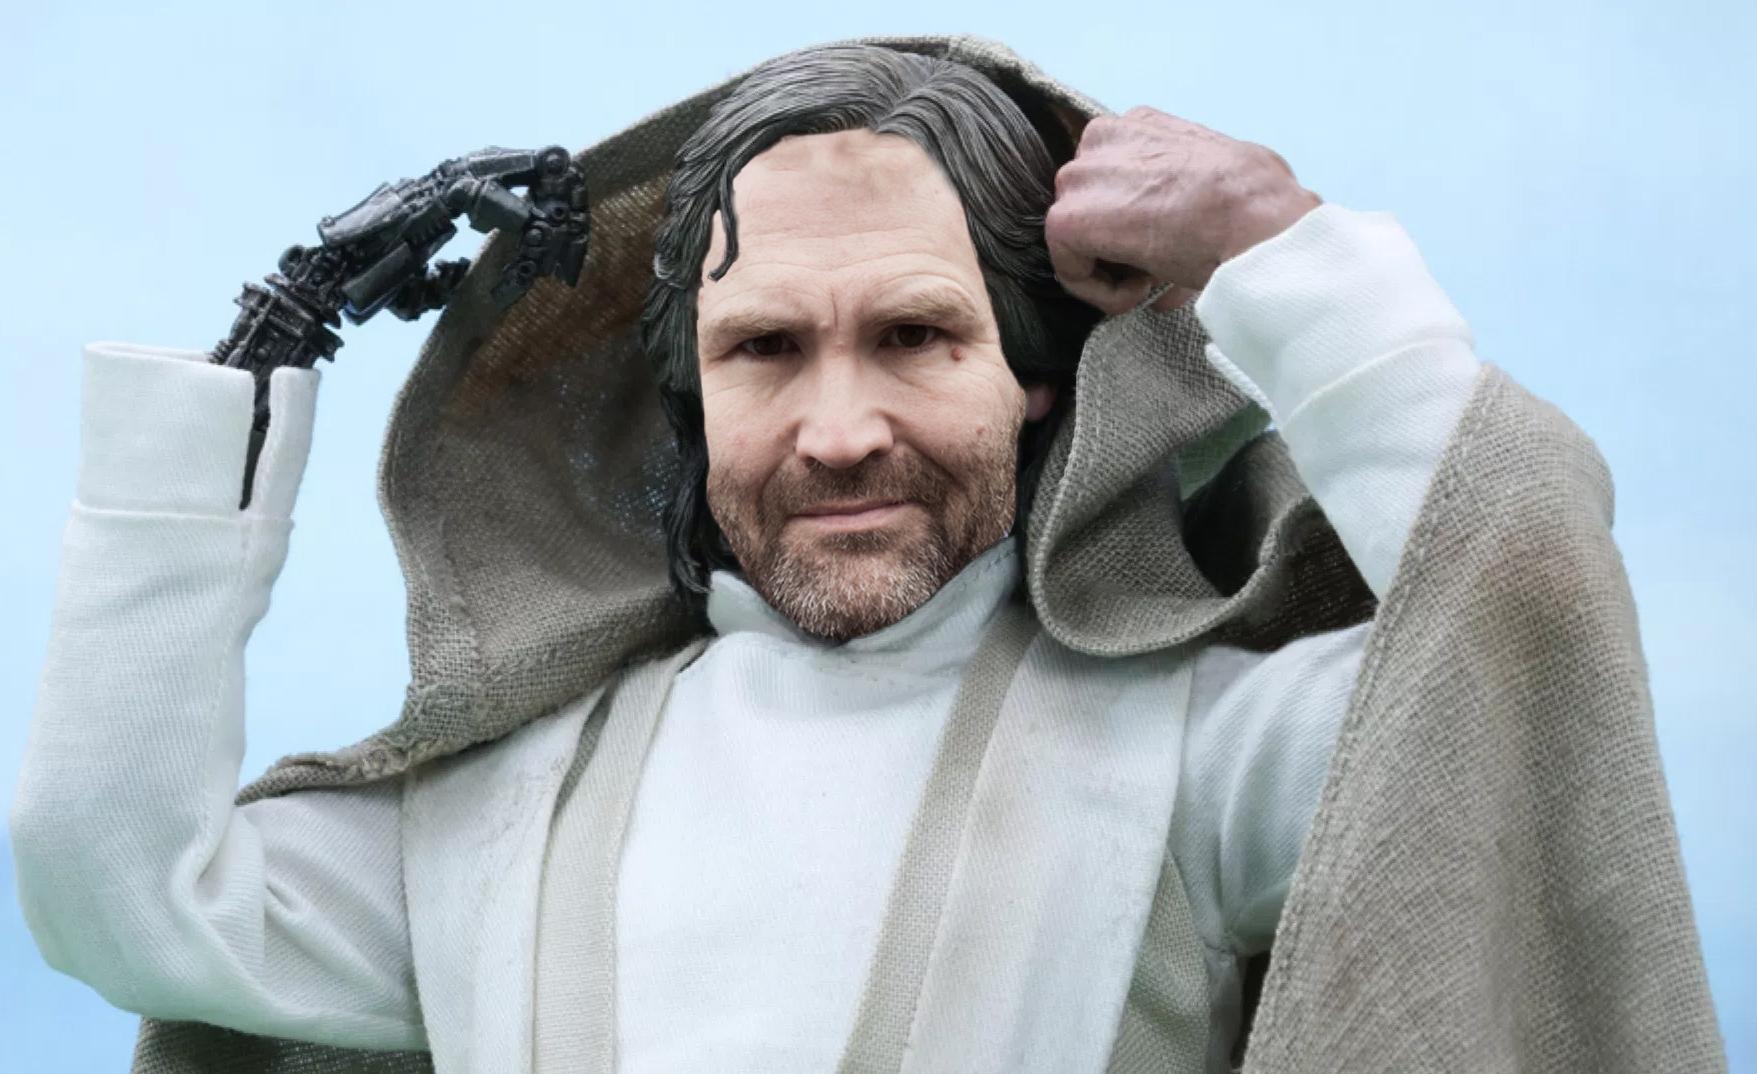 He does like a good comeback, so it's Siôn Simon as Luke Skywalker